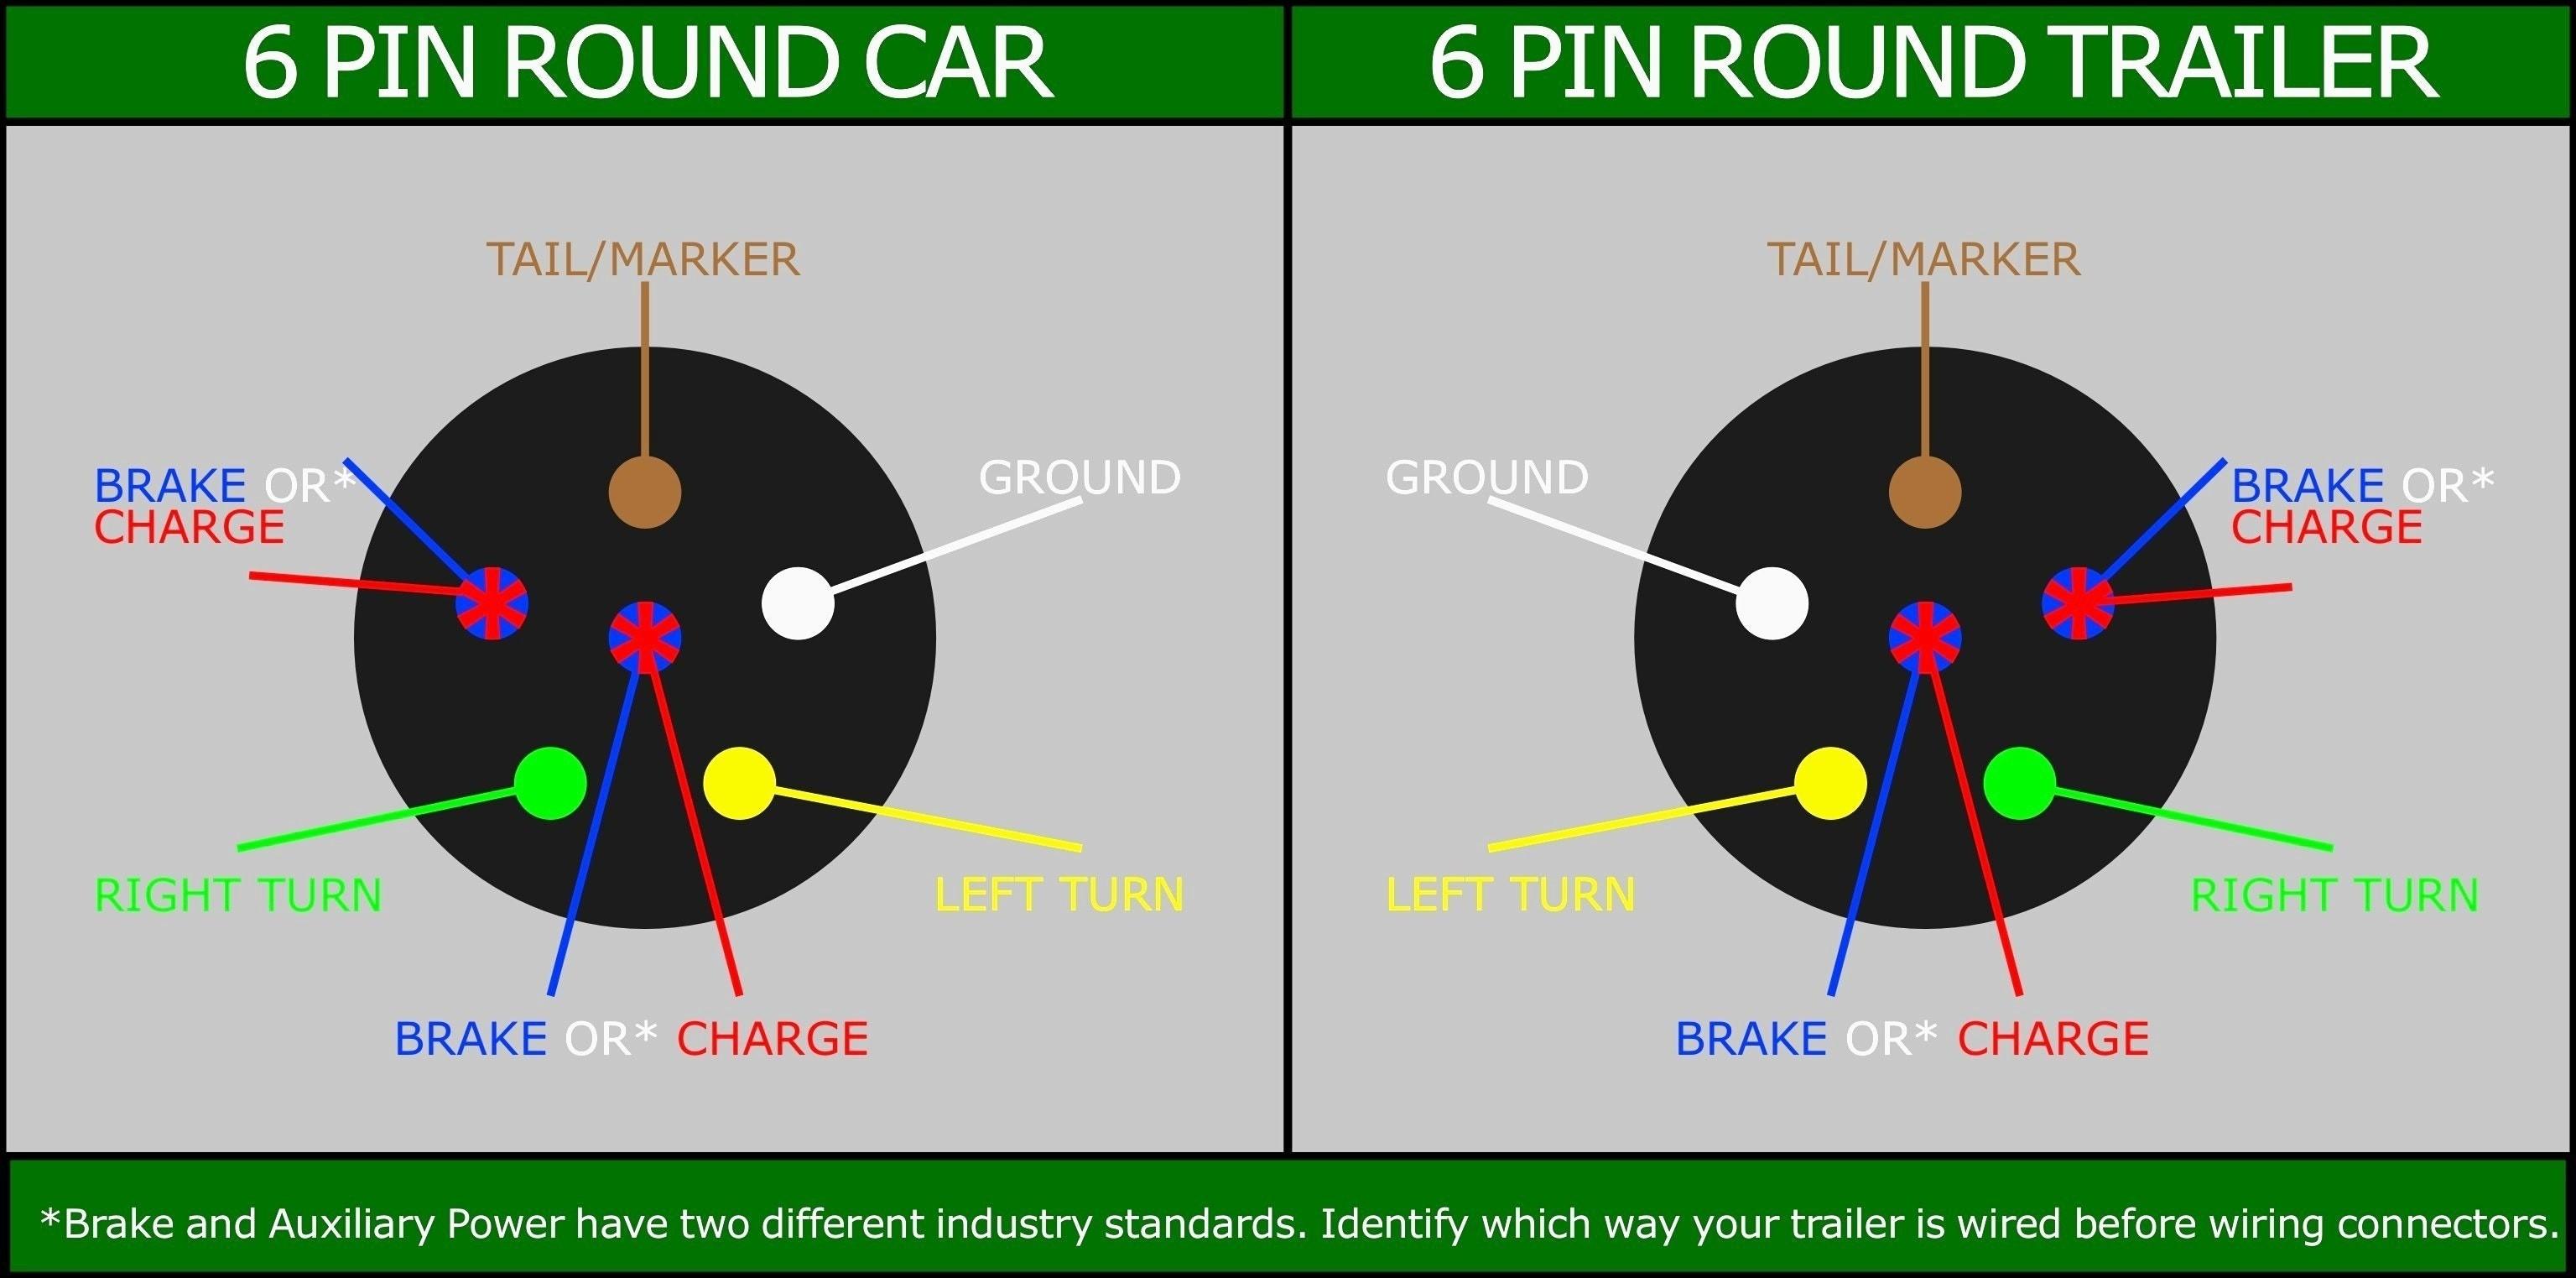 Car Trailer Wire Diagram Wiring Diagram for 7 Way Trailer Plug Electrical Circuit 7 Blade Of Car Trailer Wire Diagram